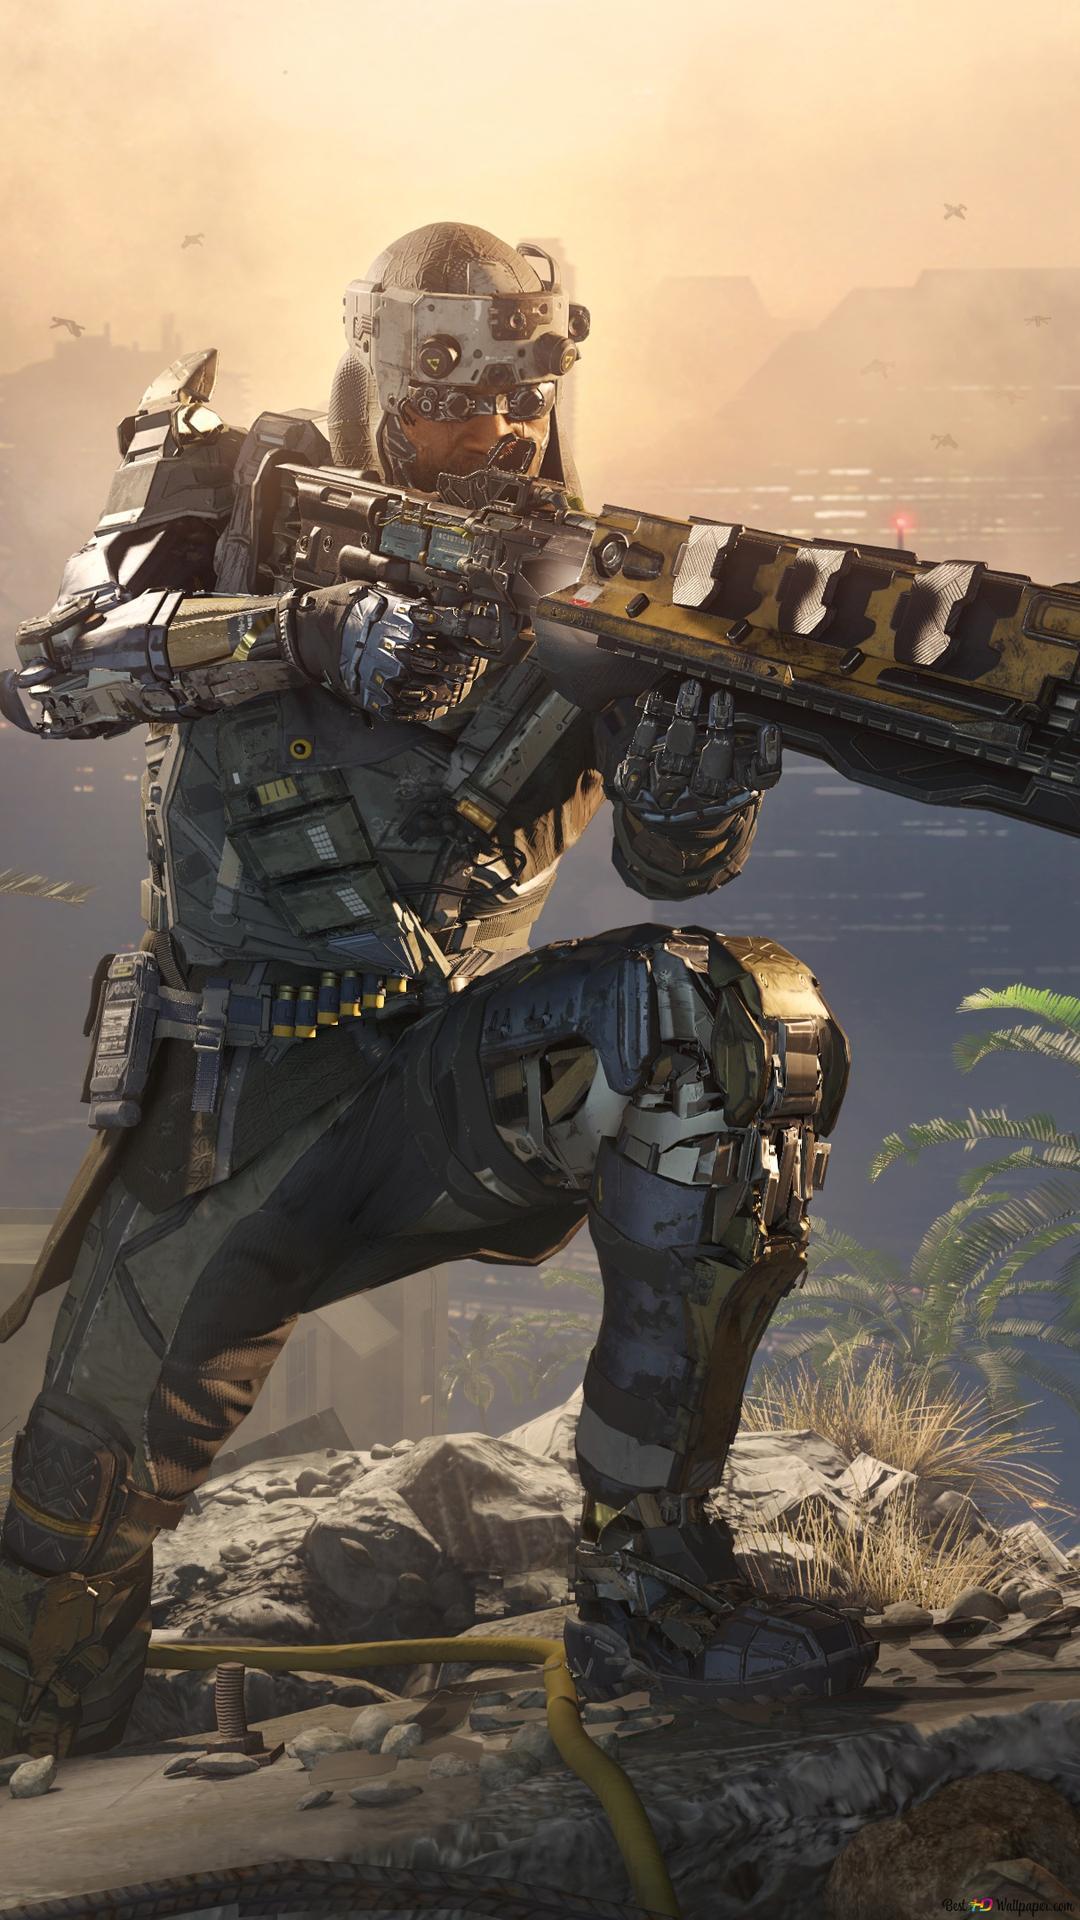 Call Of Duty Black Ops 3 Prophet Hd Wallpaper Download